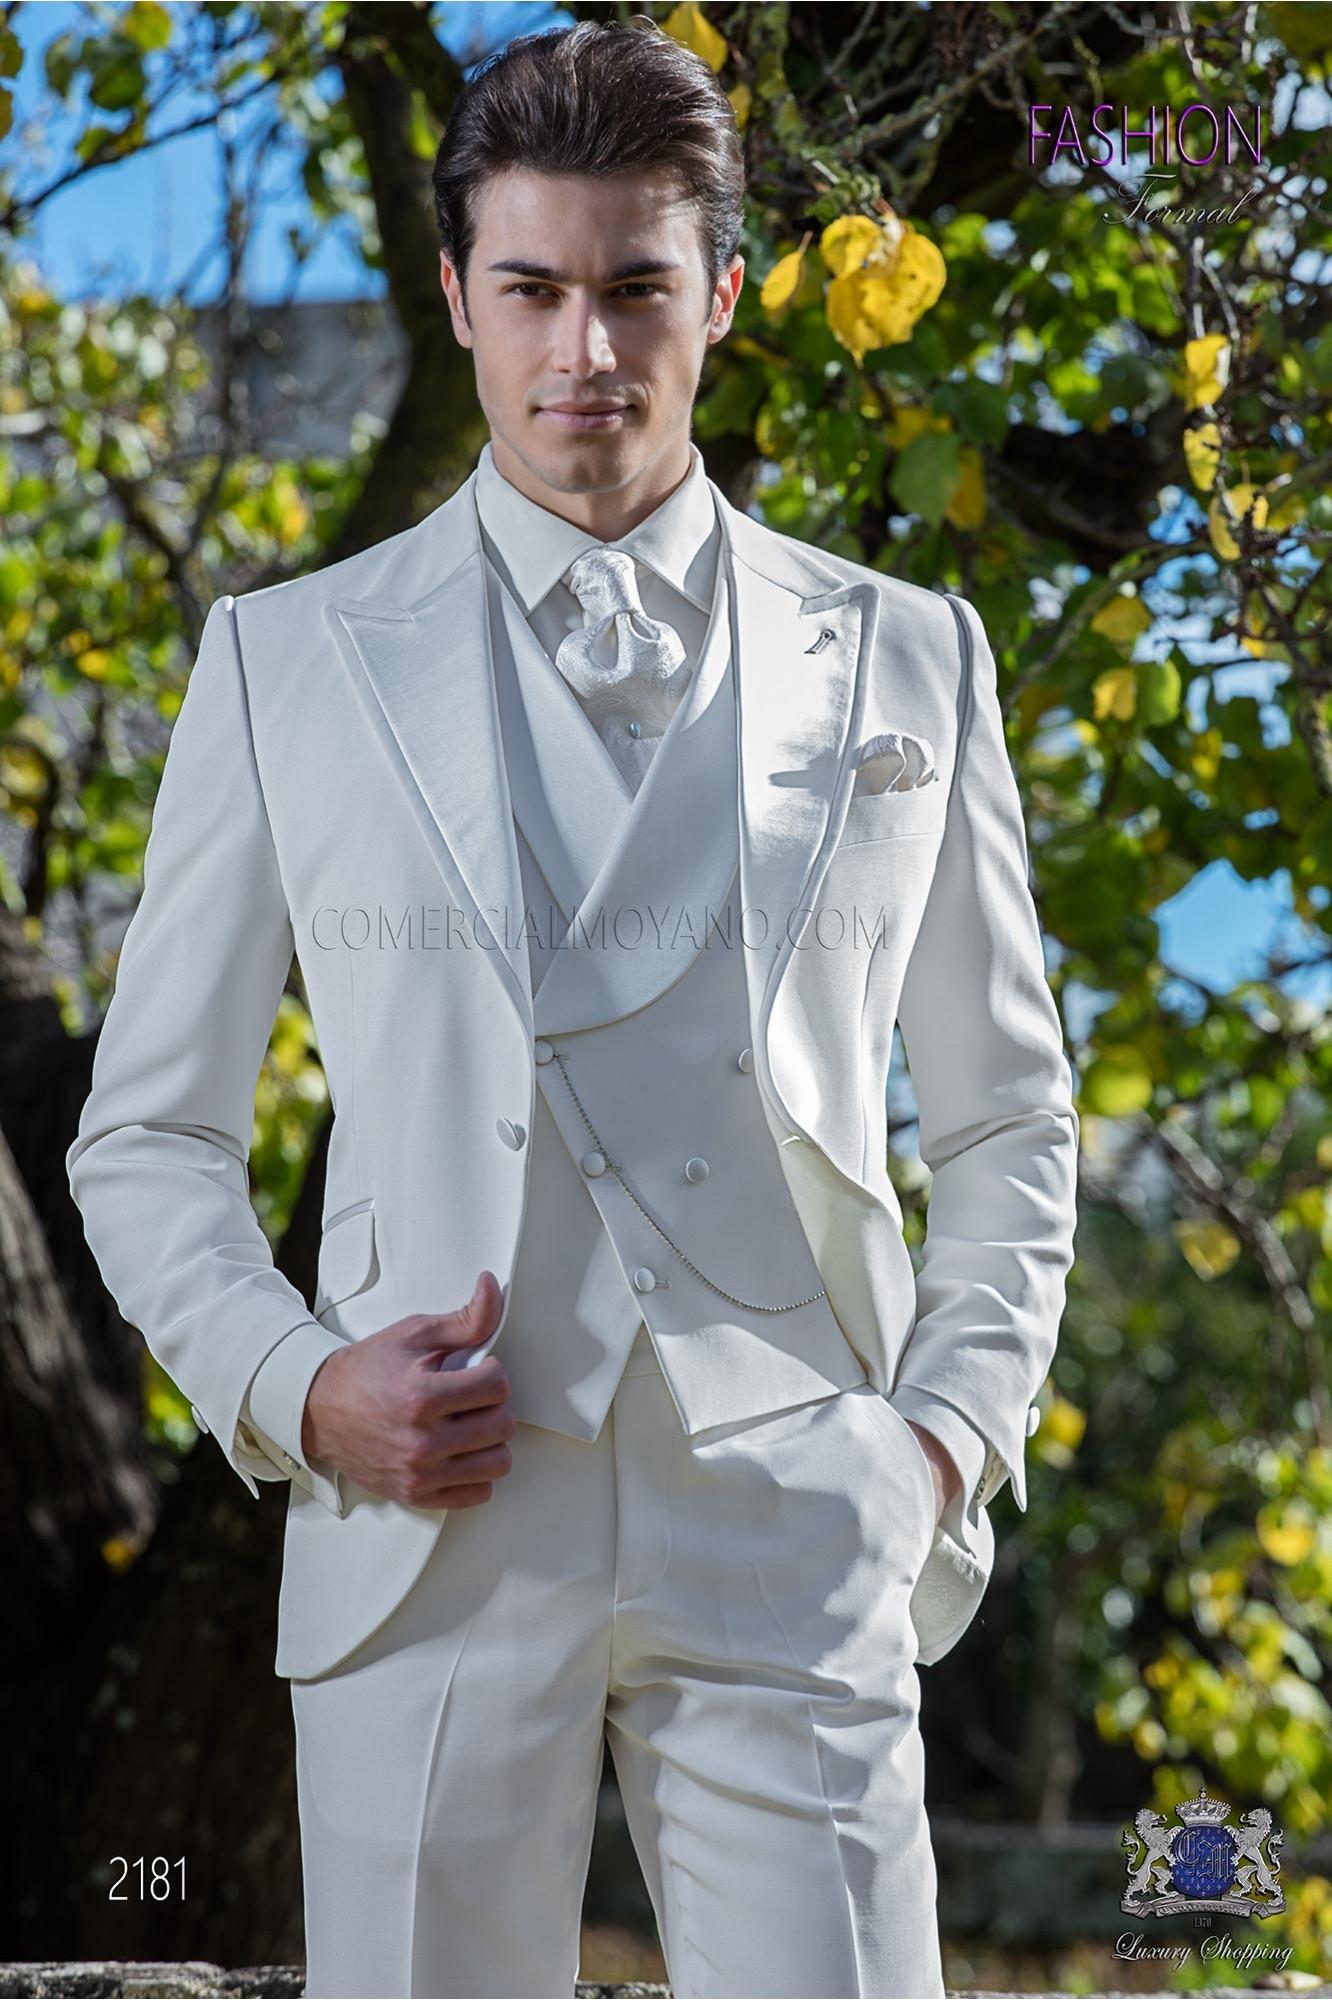 elegante en estilo tienda de descuento hermoso estilo Traje de novio moderno blanco con solapa de raso